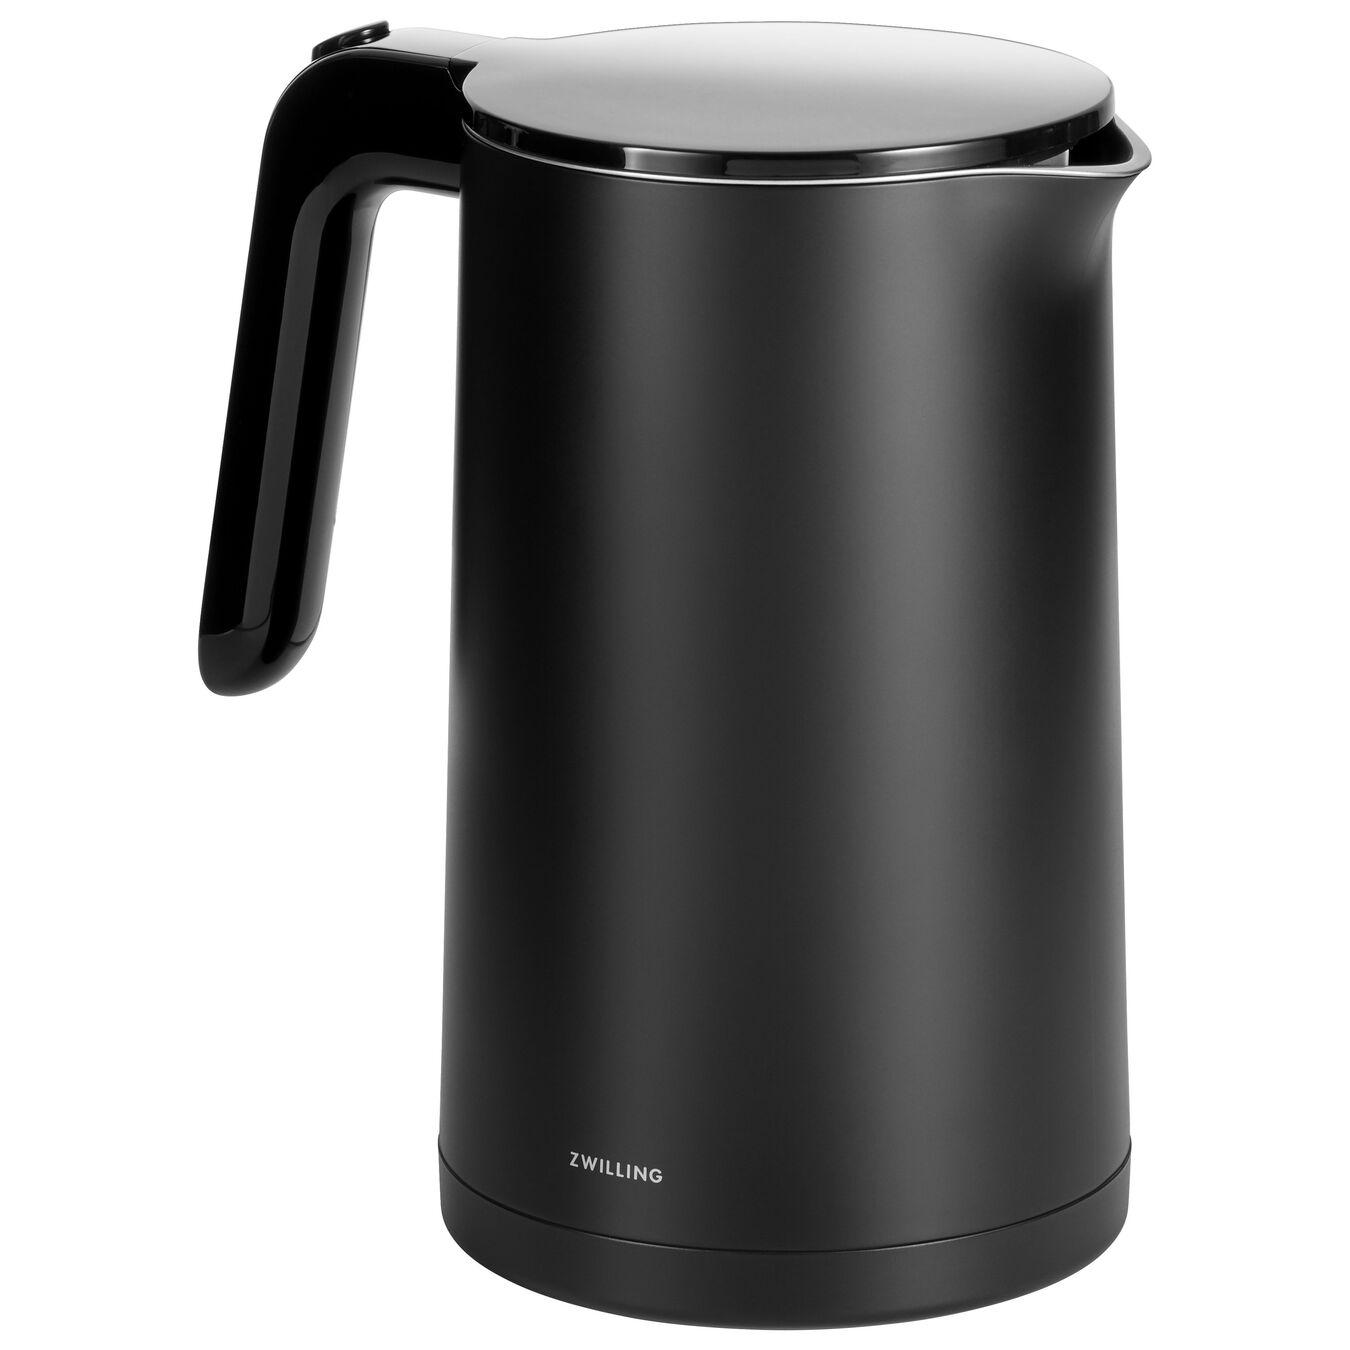 Wasserkocher, 1,5 l, Schwarz,,large 1